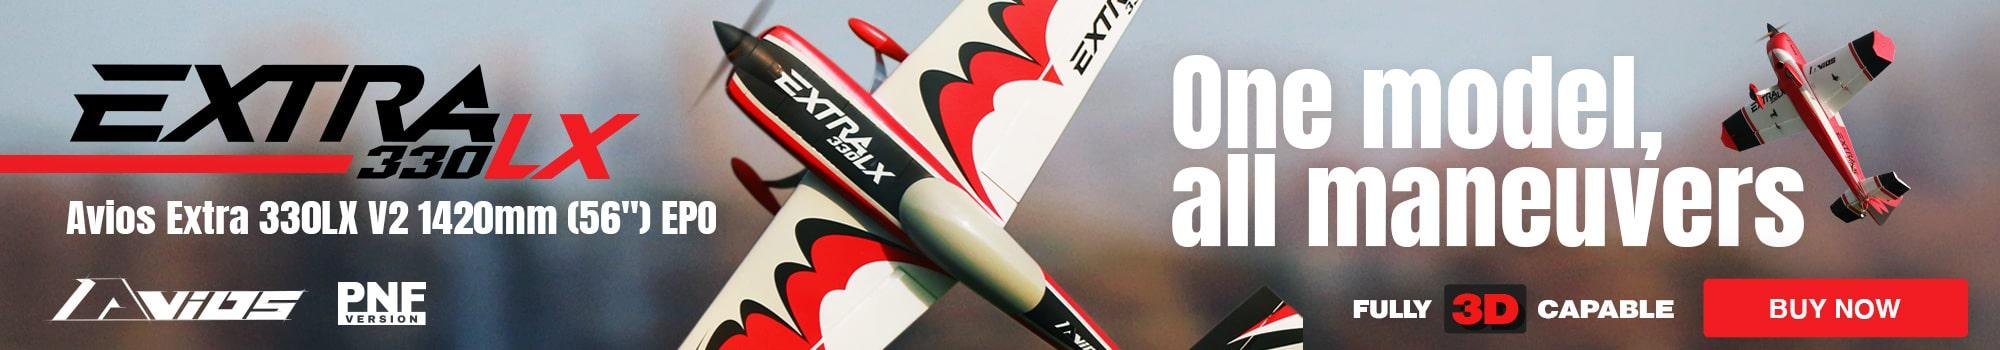 Avios Extra 330LX - Buy Now!